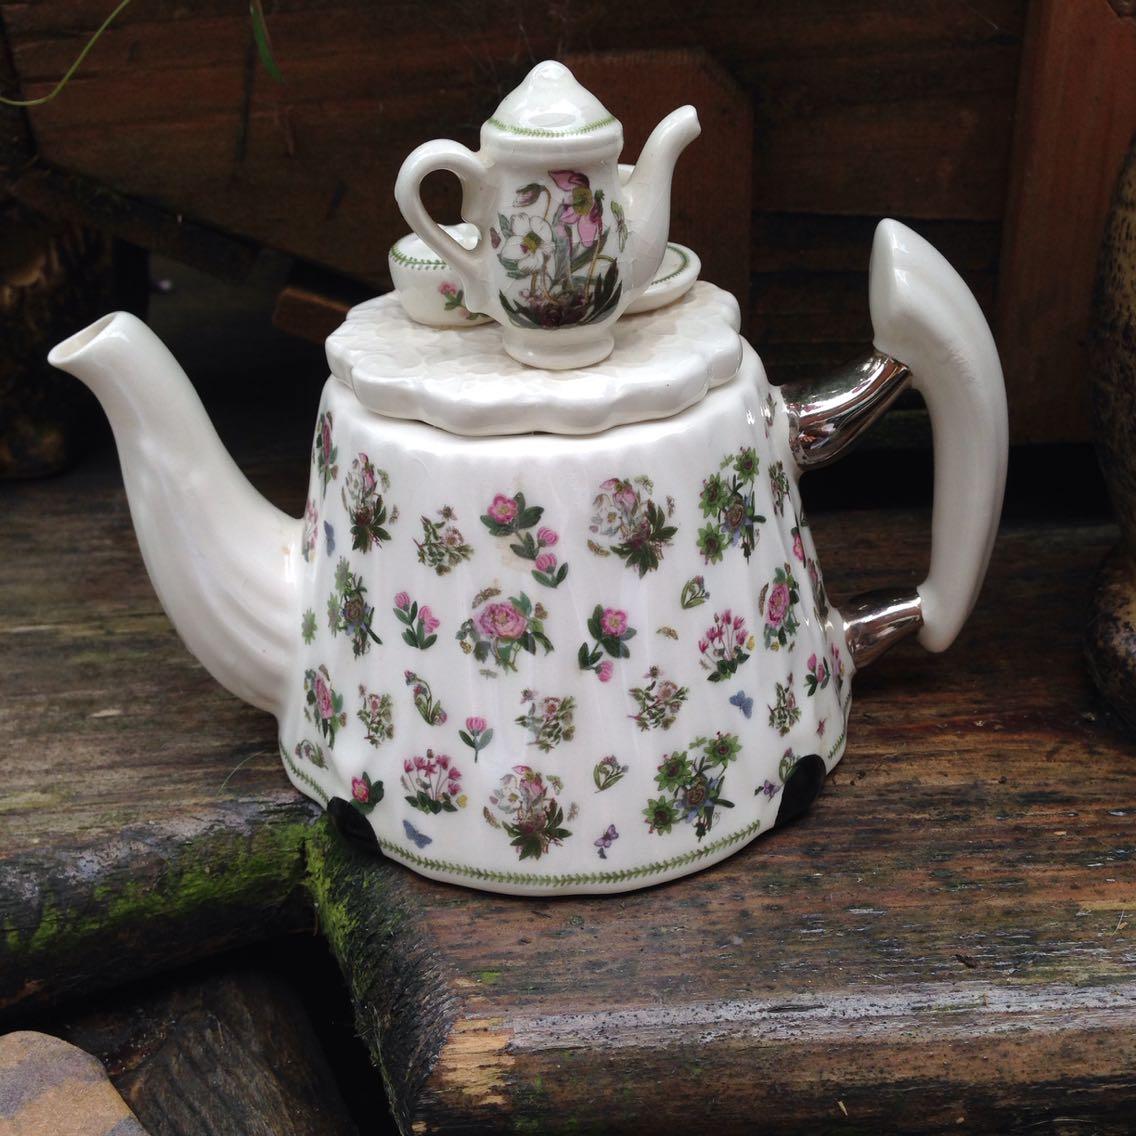 Vintage Cardew Design Tea Shop Teapot Signed Vgc Cardew